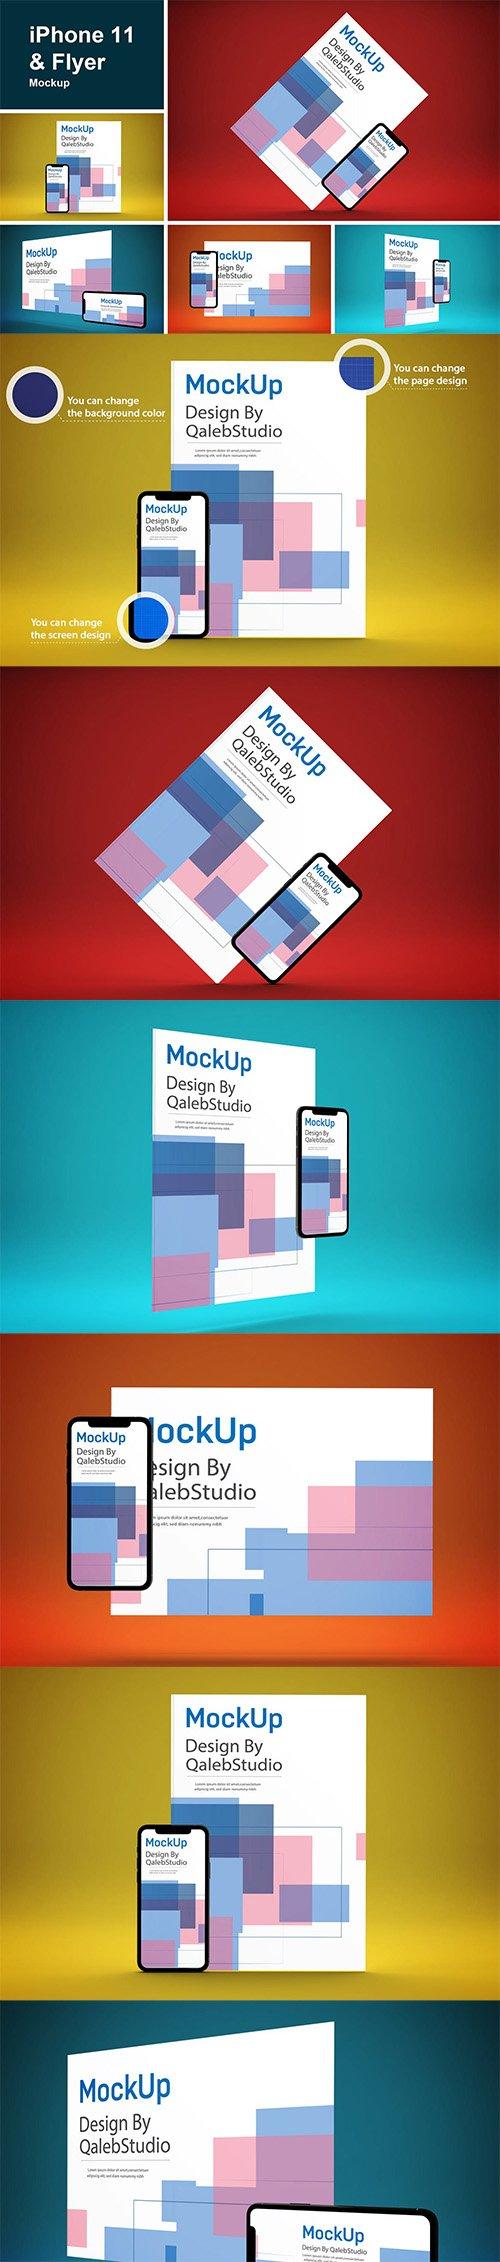 iPhone 11 & Flyer Mockup